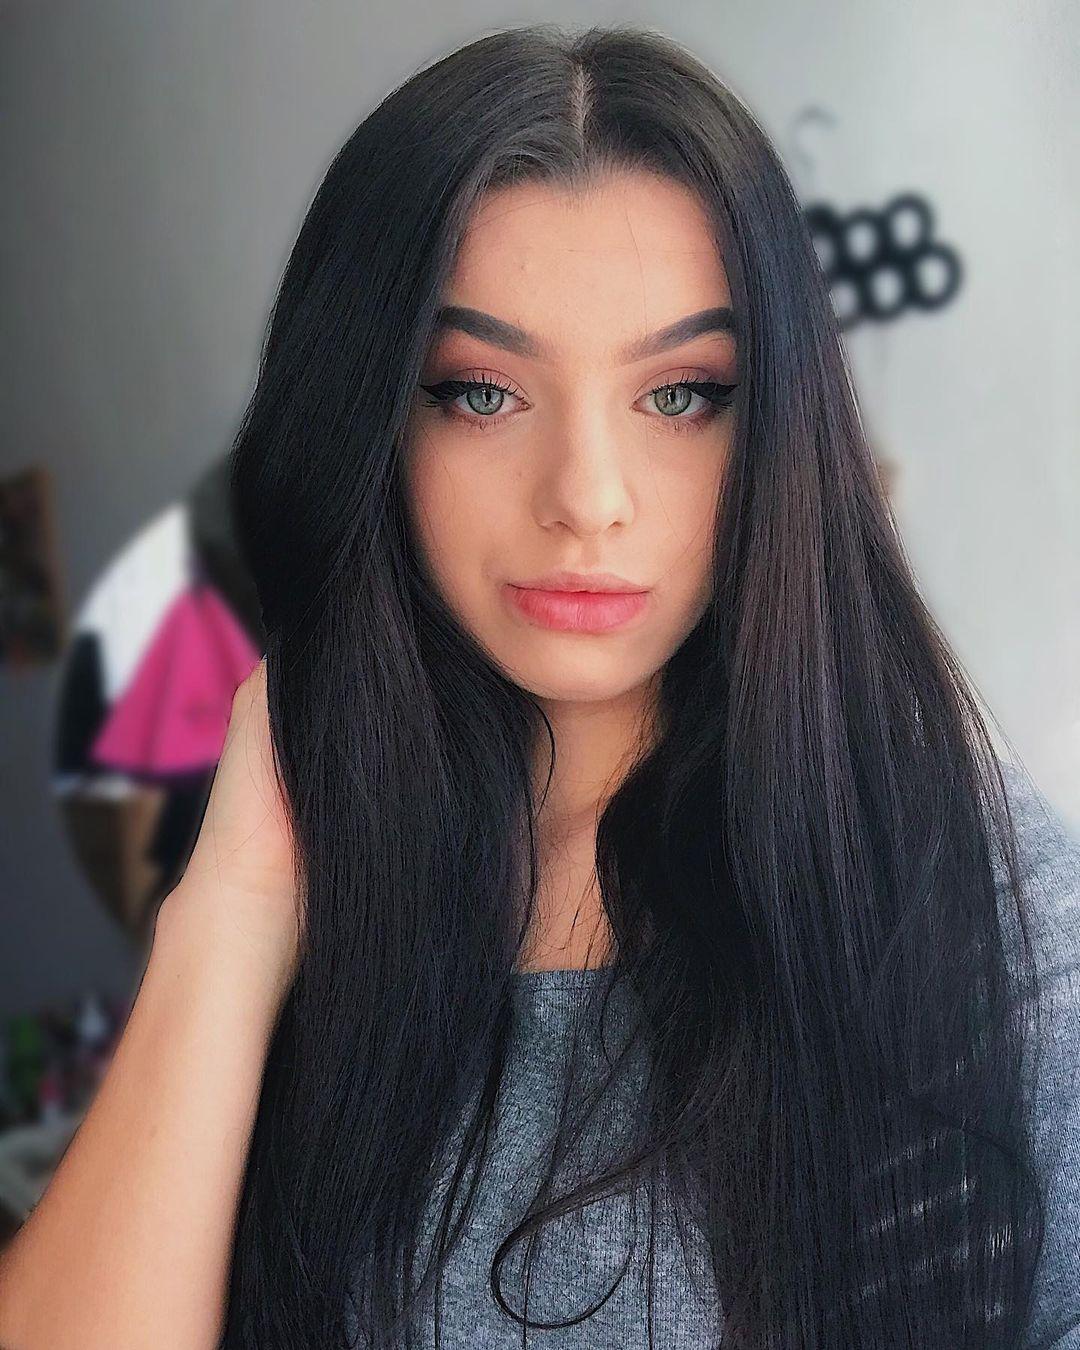 Laurencikova-Laura-Wallpapers-Insta-Fit-Bio-Laura-Laurencikova-Wallpapers-Insta-Fit-Bio-10